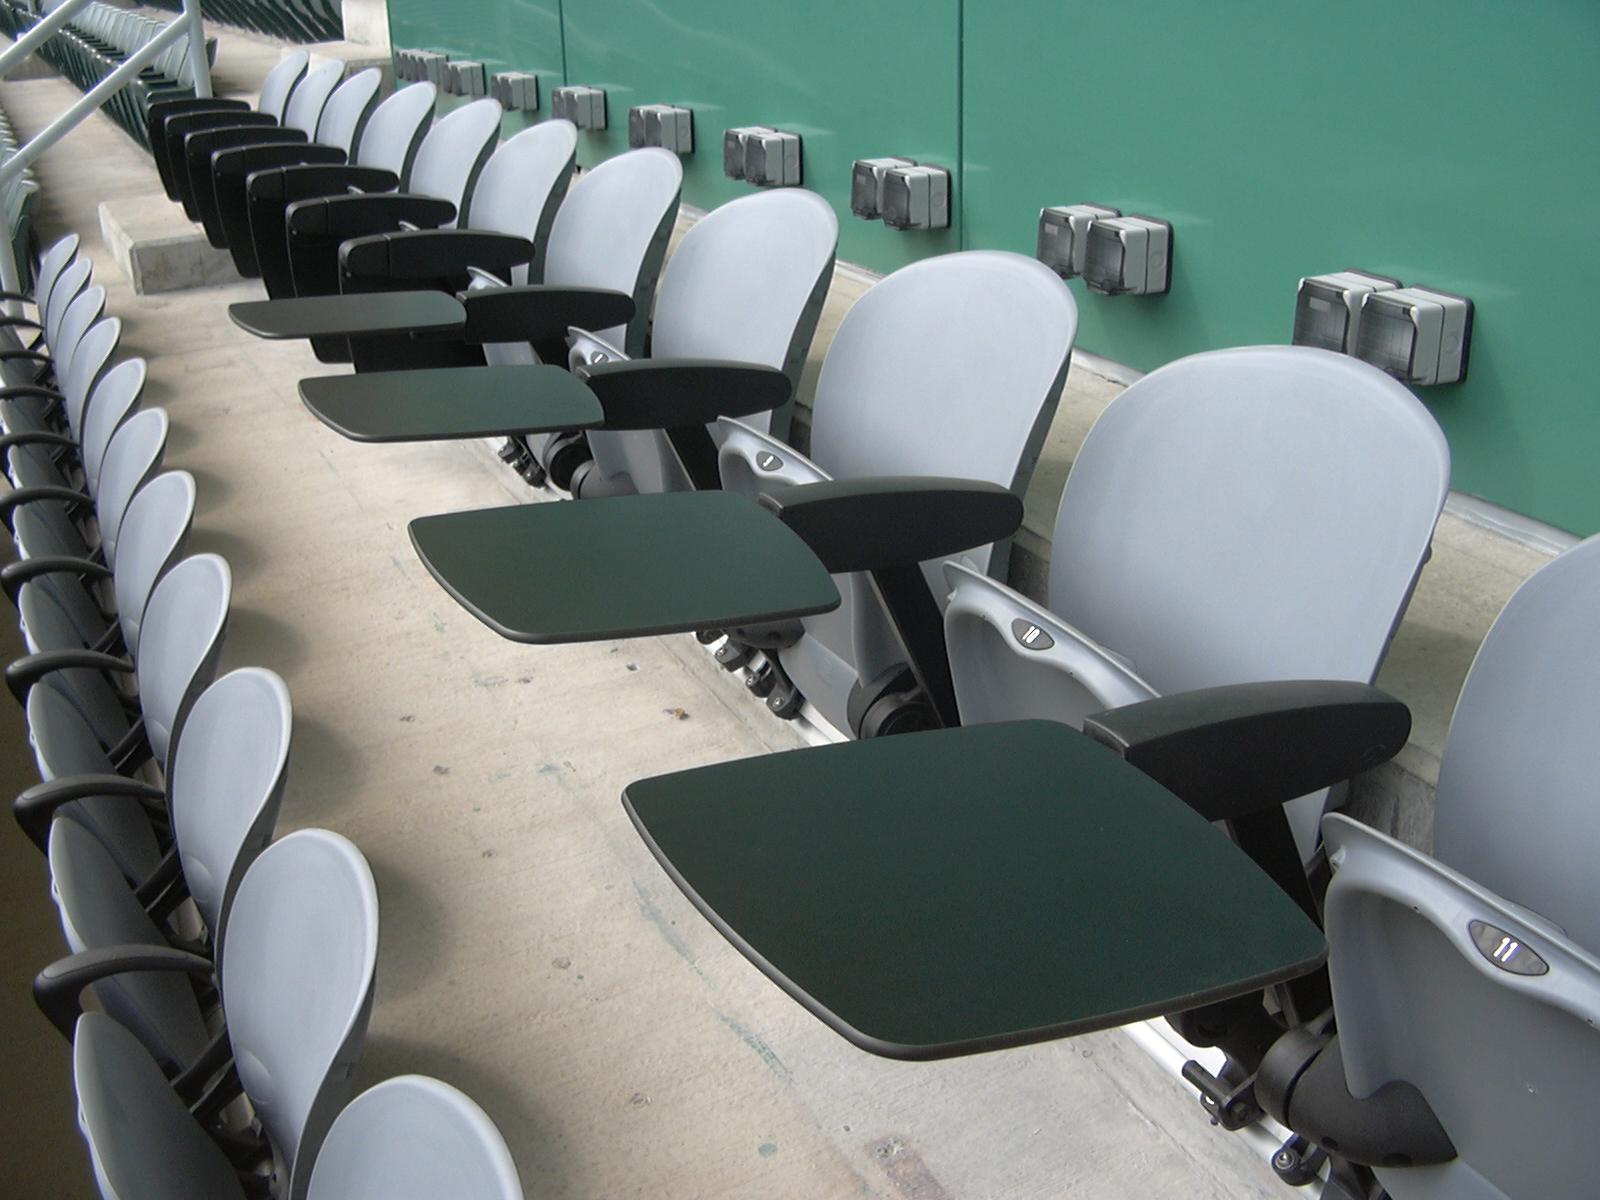 HK Stadium Press Seating 033.jpg